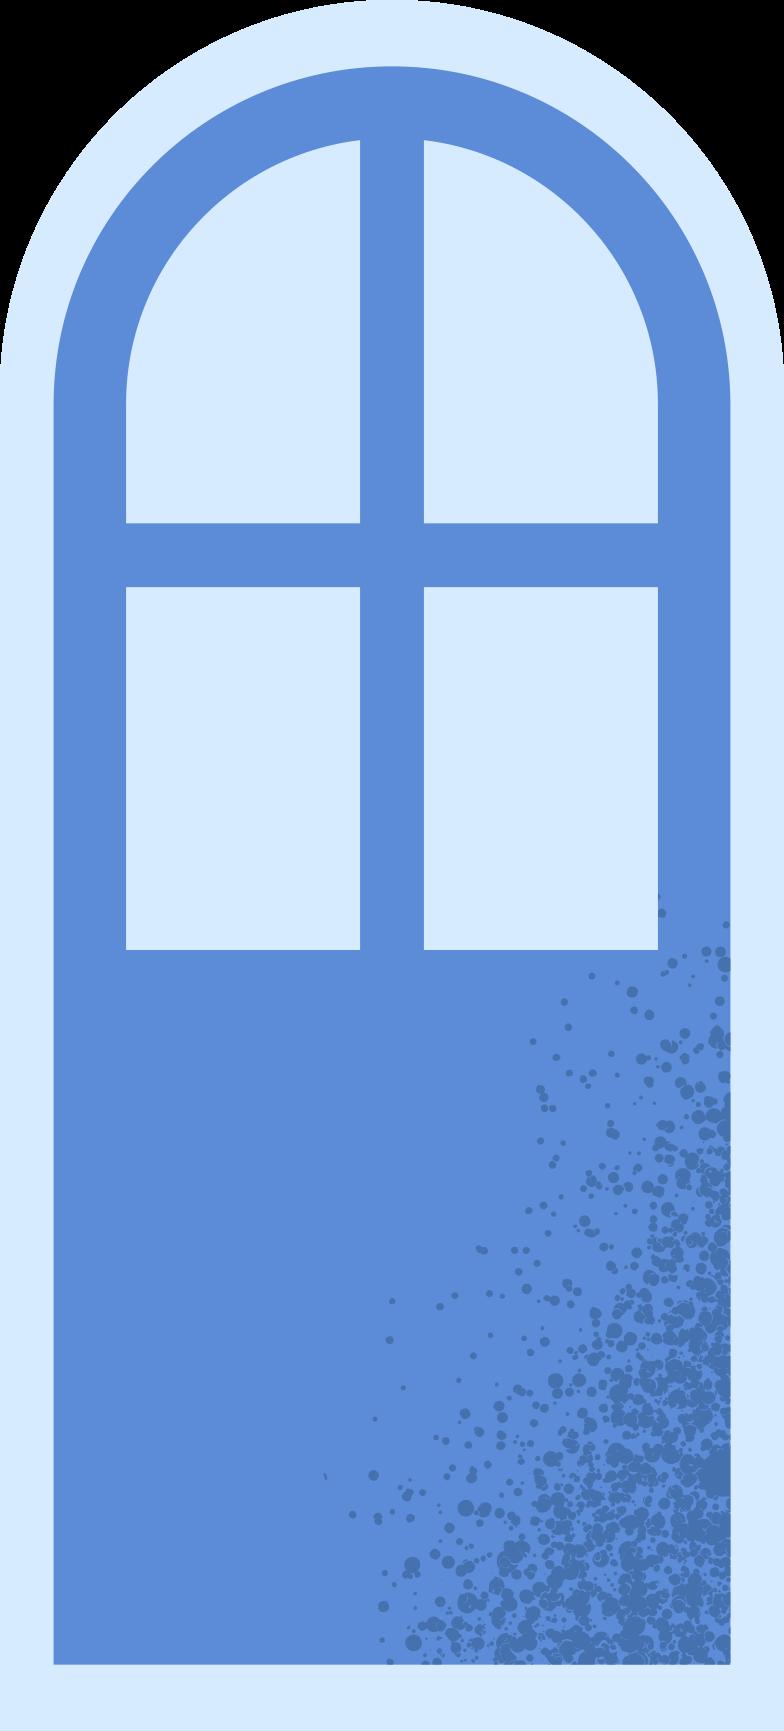 balcony door Clipart illustration in PNG, SVG